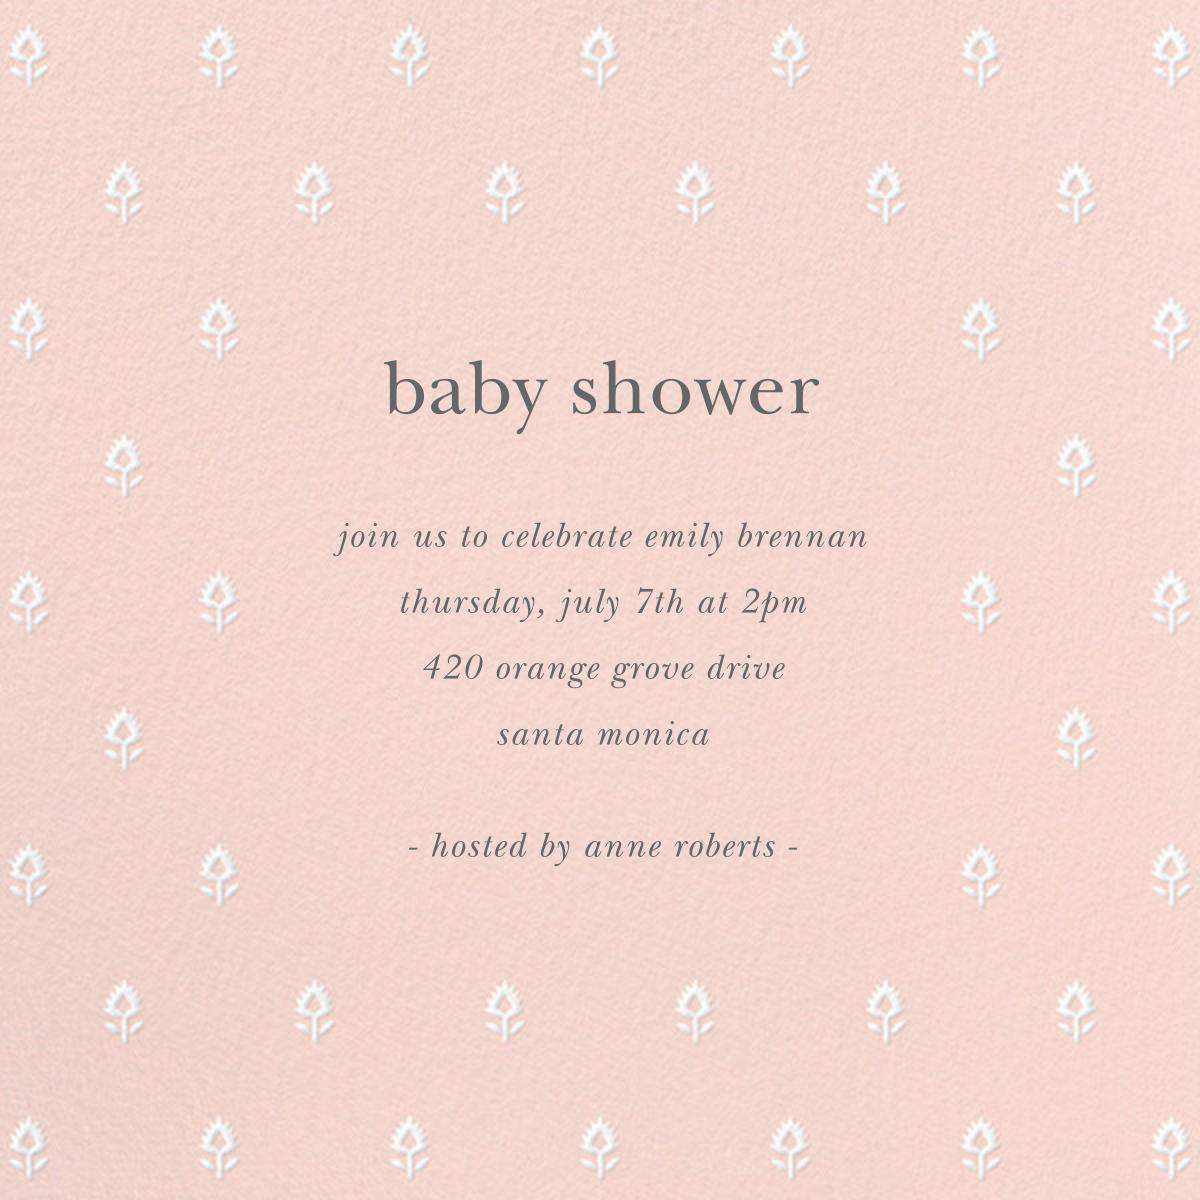 Embroidered Blossom - Meringue - Sugar Paper - Baby shower